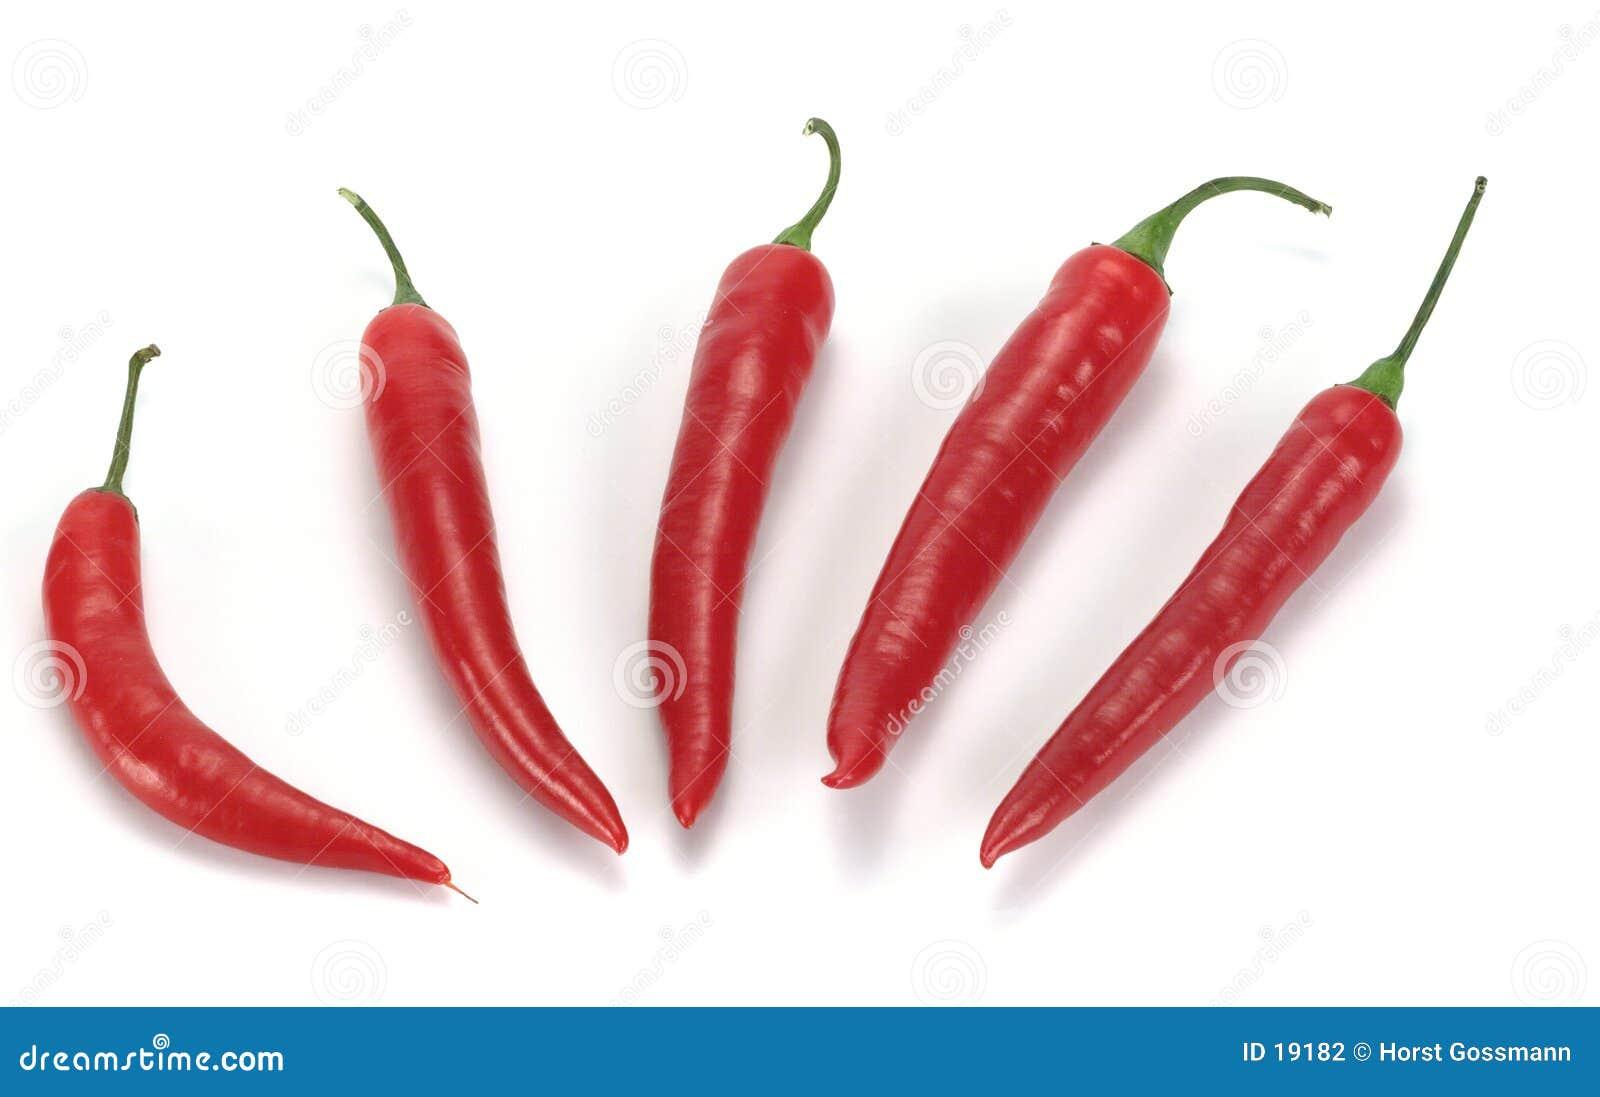 Pepe di peperoncino rosso